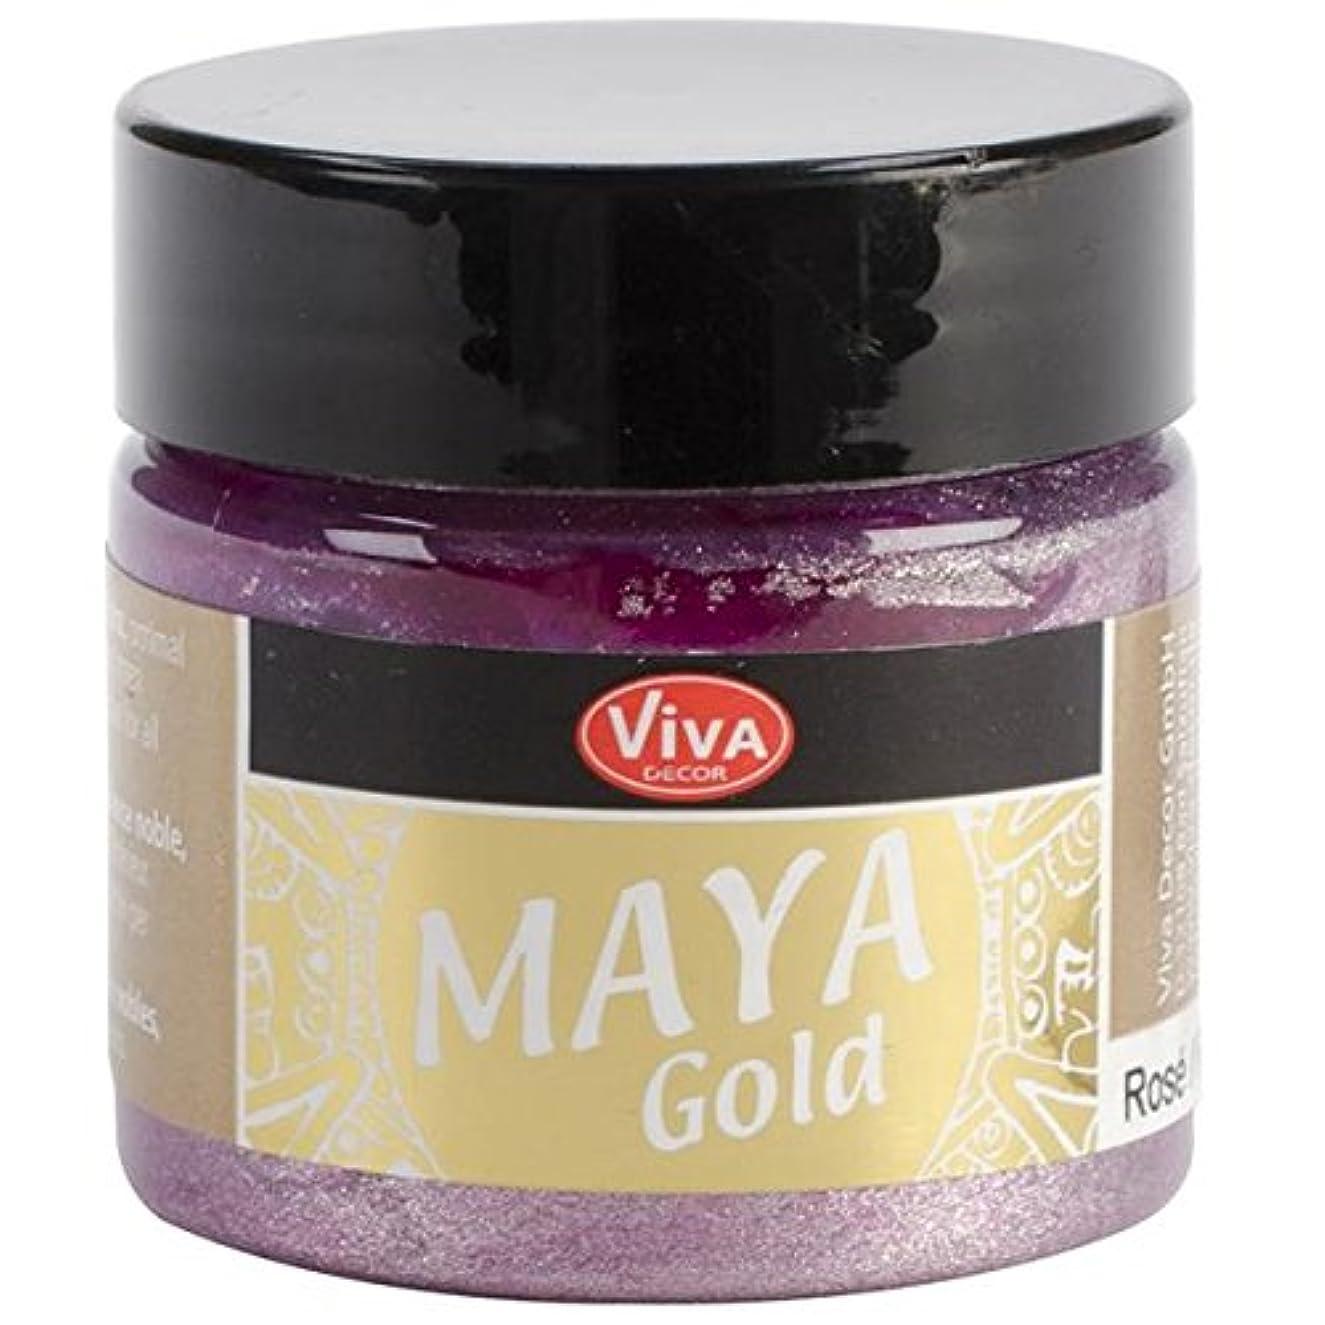 Viva Decor 123240234 Maya Gold Paint, Rose